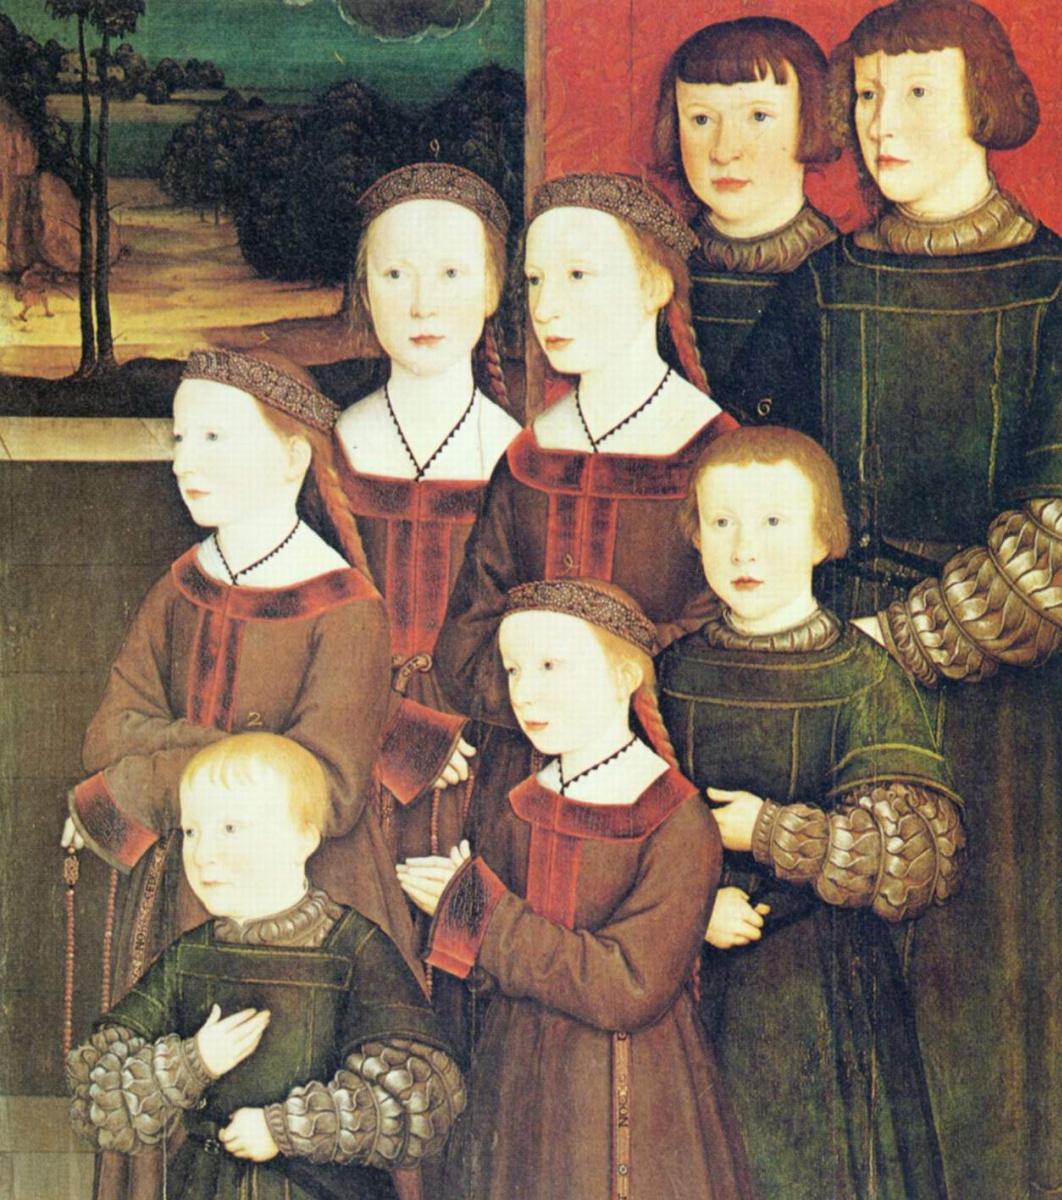 Bernhard Strigel. Conrad Rehlinger Sr. with his eight children, right. Eight children of Konrad Rehlinger